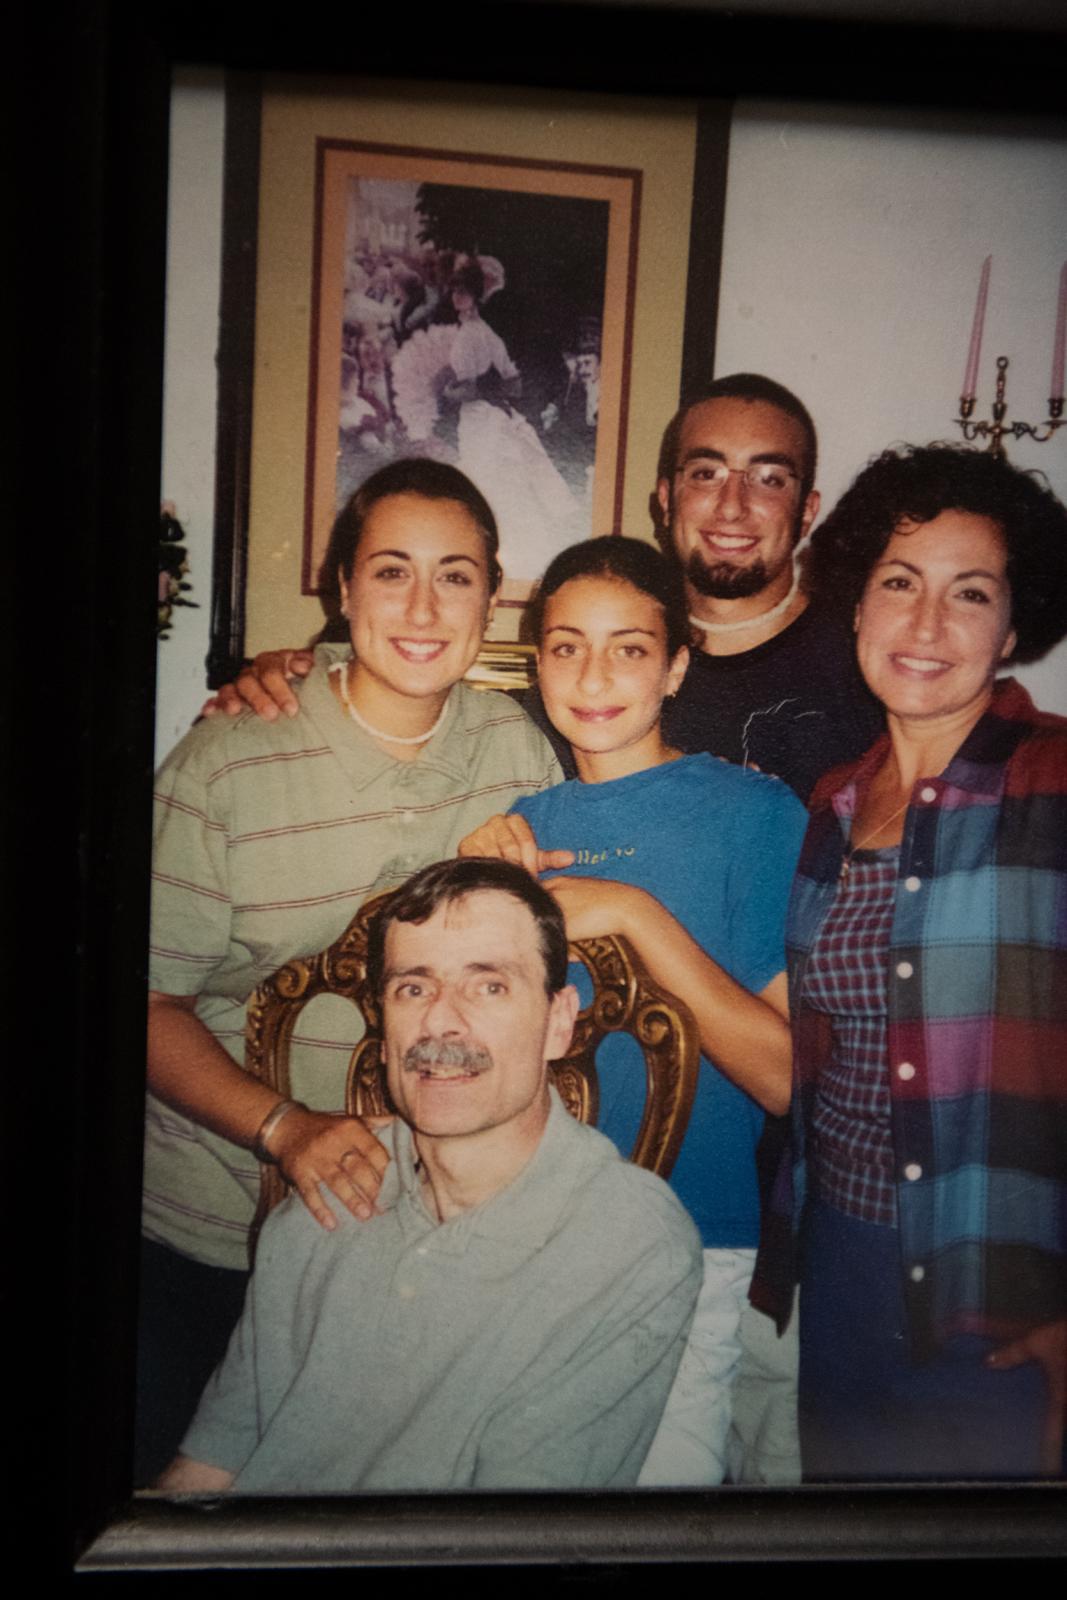 TONY LOMBARDO,ANTHONY,MULTIPLE SCLEROSIS;SUICIDE